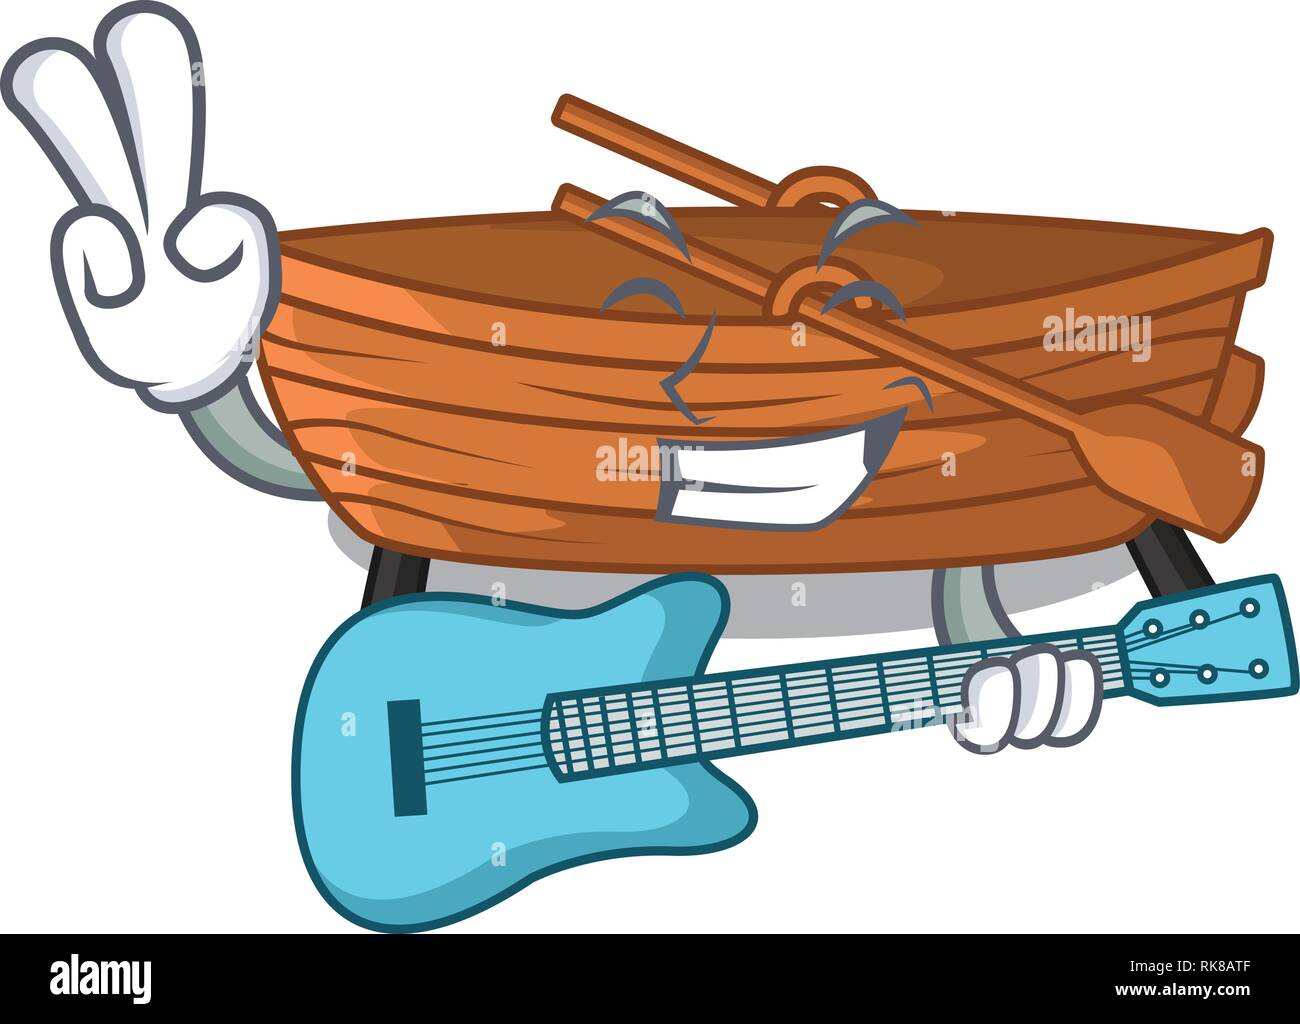 With guitar wooden boat sail at sea character - Stock Image